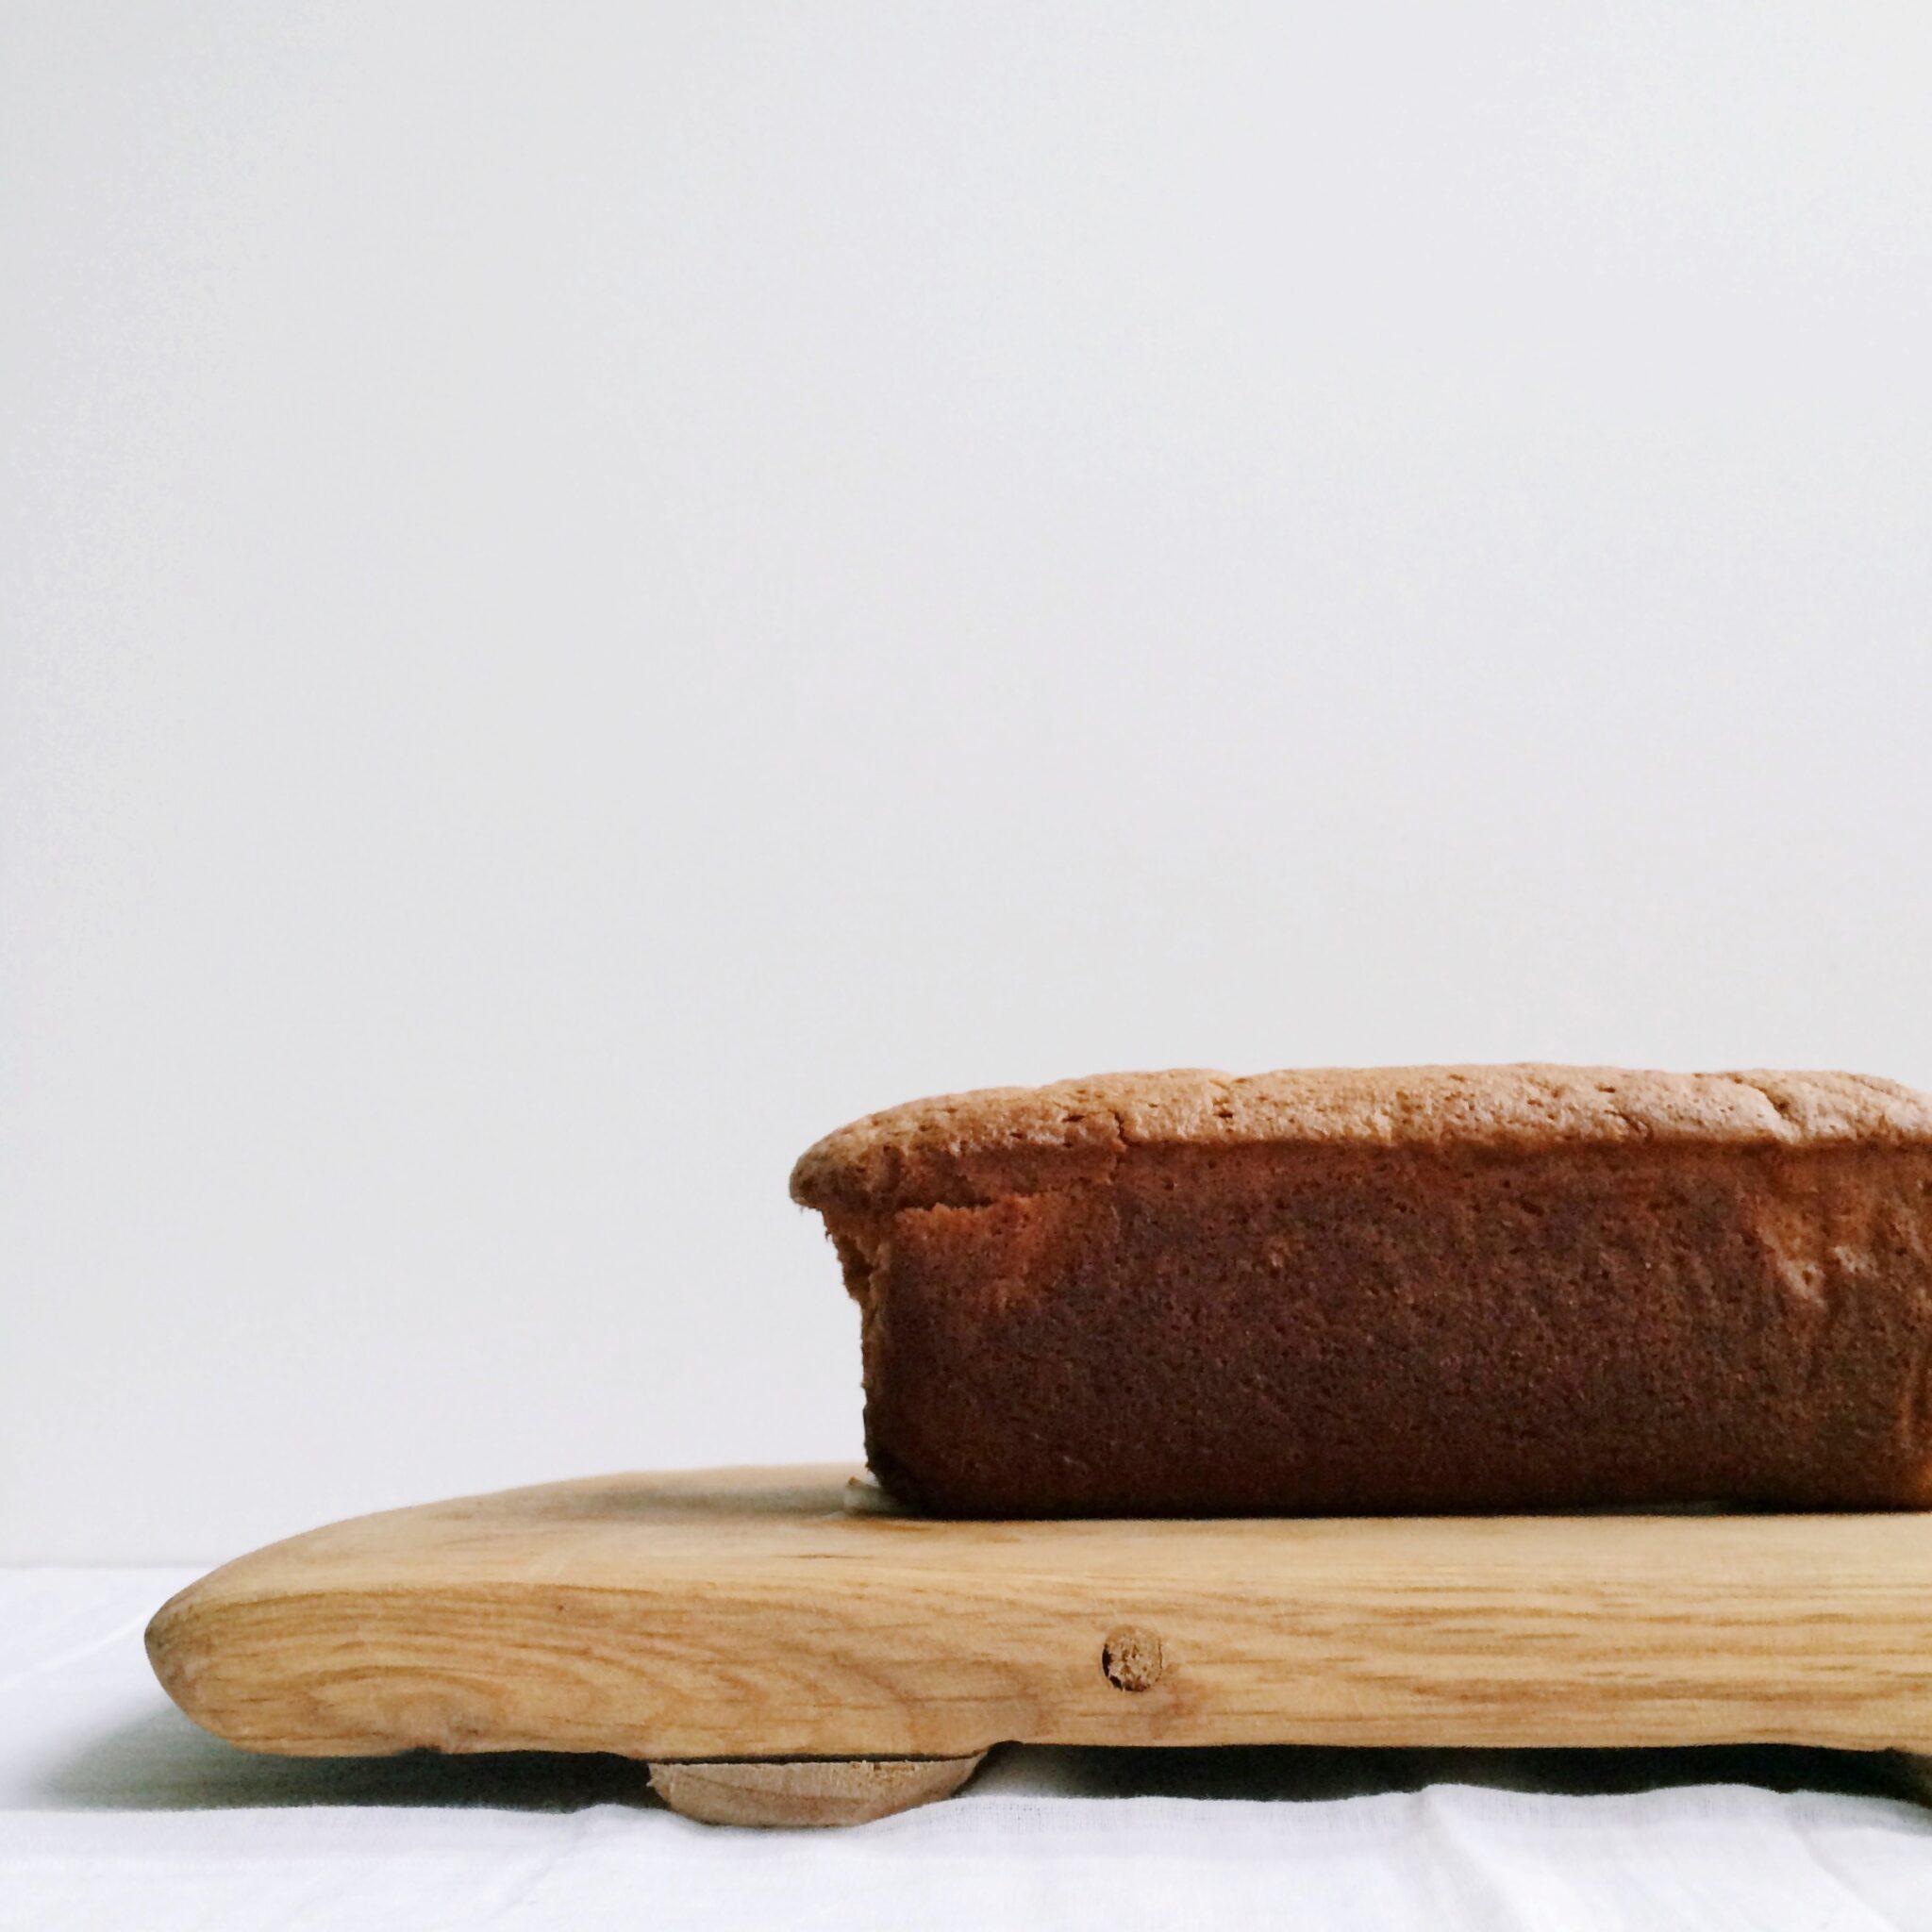 IMG 1030 - Bananenbrood obsessie